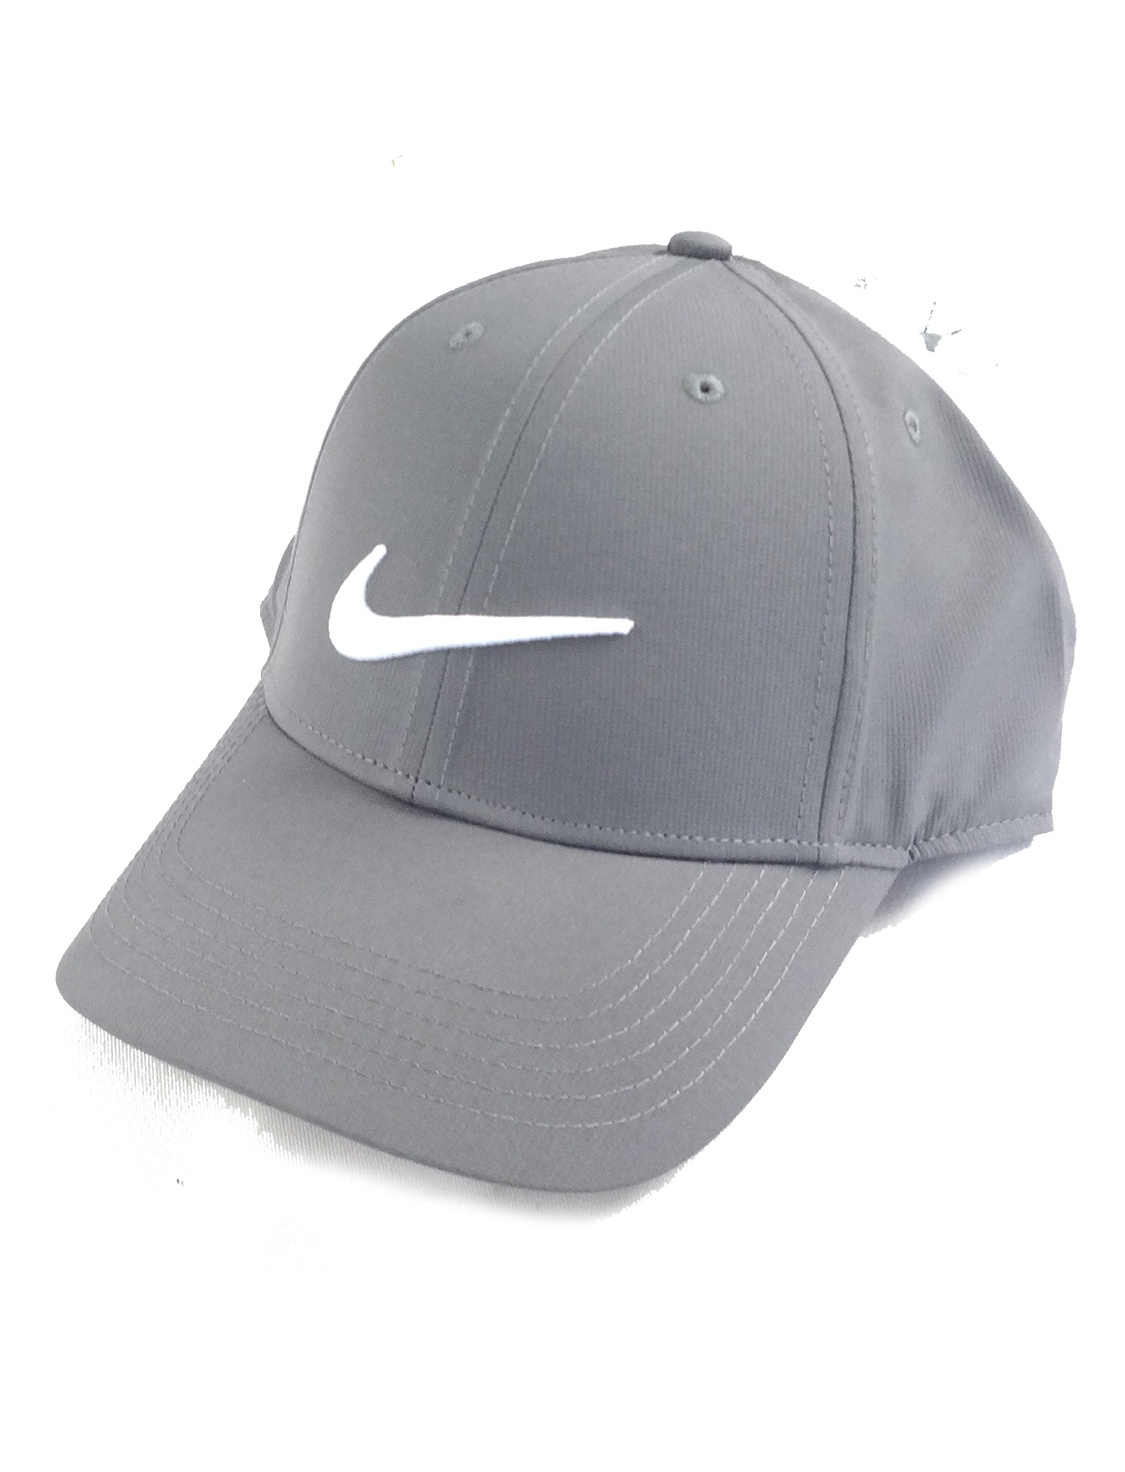 8d142c6b ... closeout nike new nike legacy tech swoosh dark gray white youth  adjustable hat cap walmart 6d1db